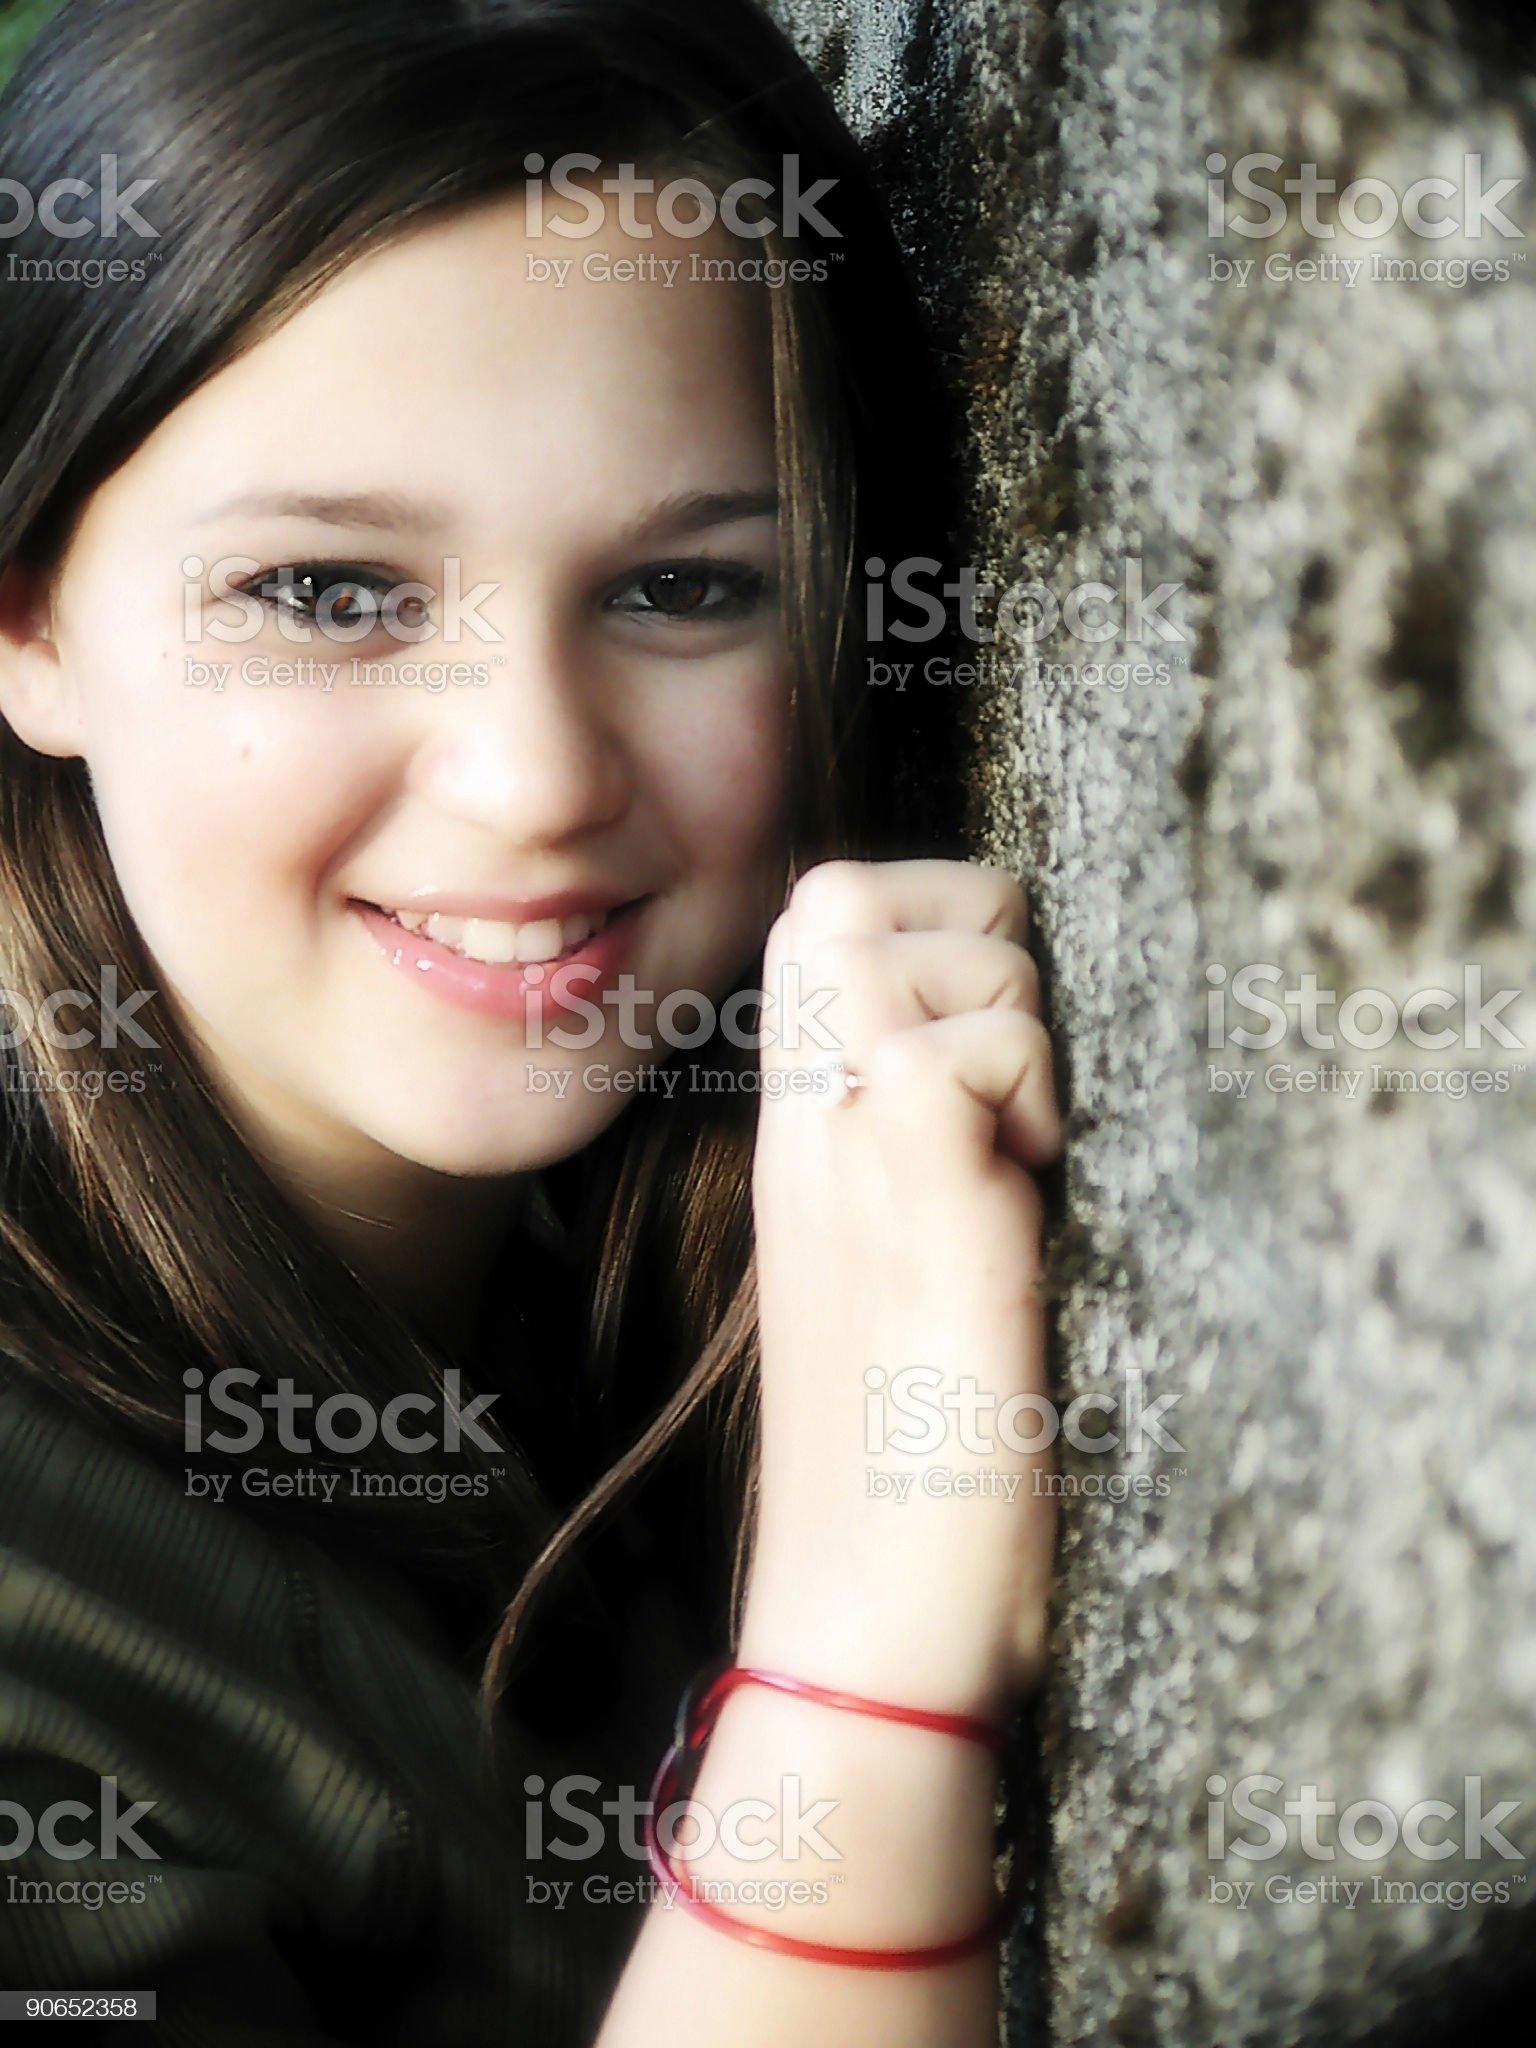 Moriah's Sweet Smile royalty-free stock photo